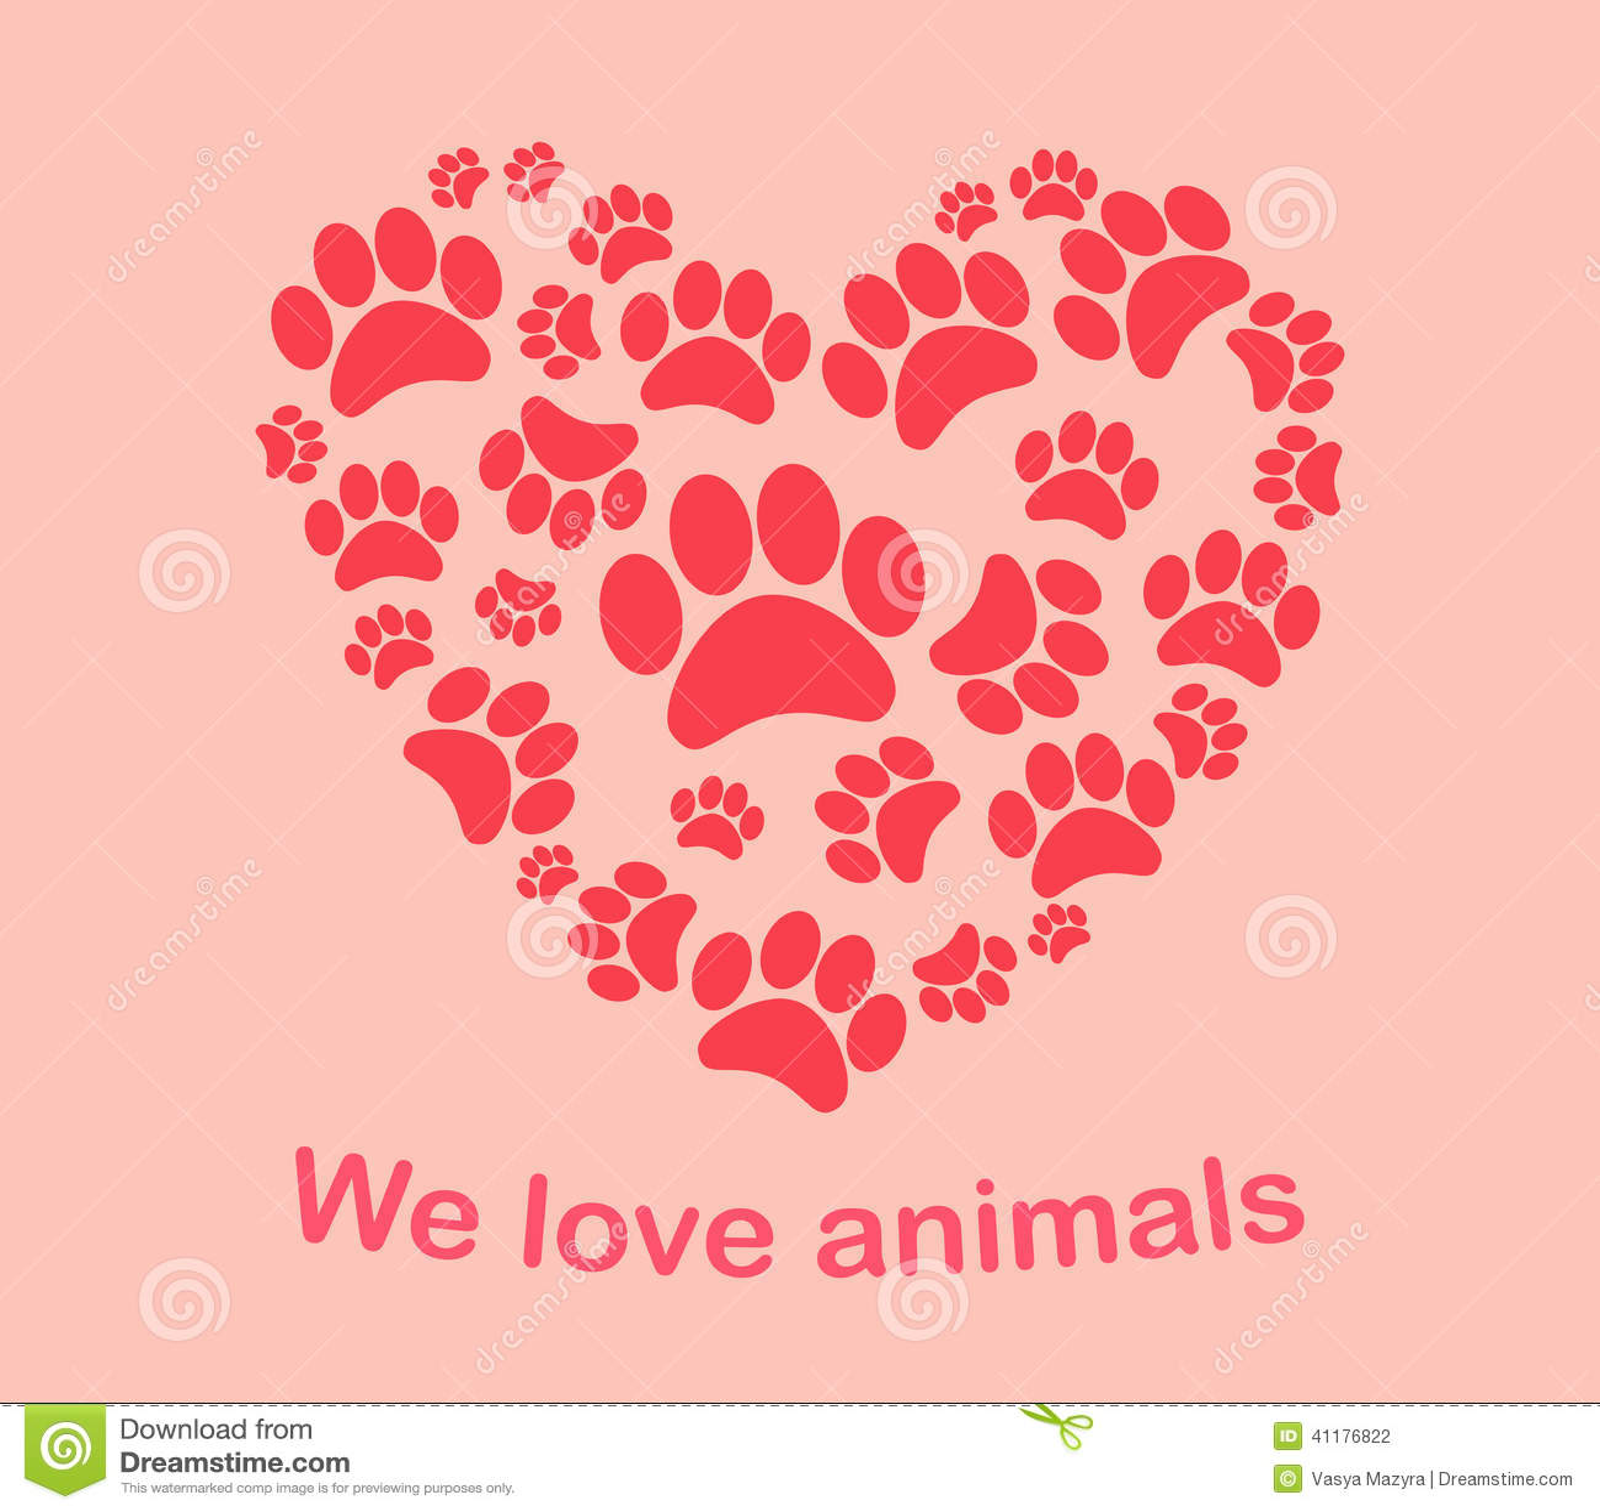 Heart animal s footprints Print we love animals